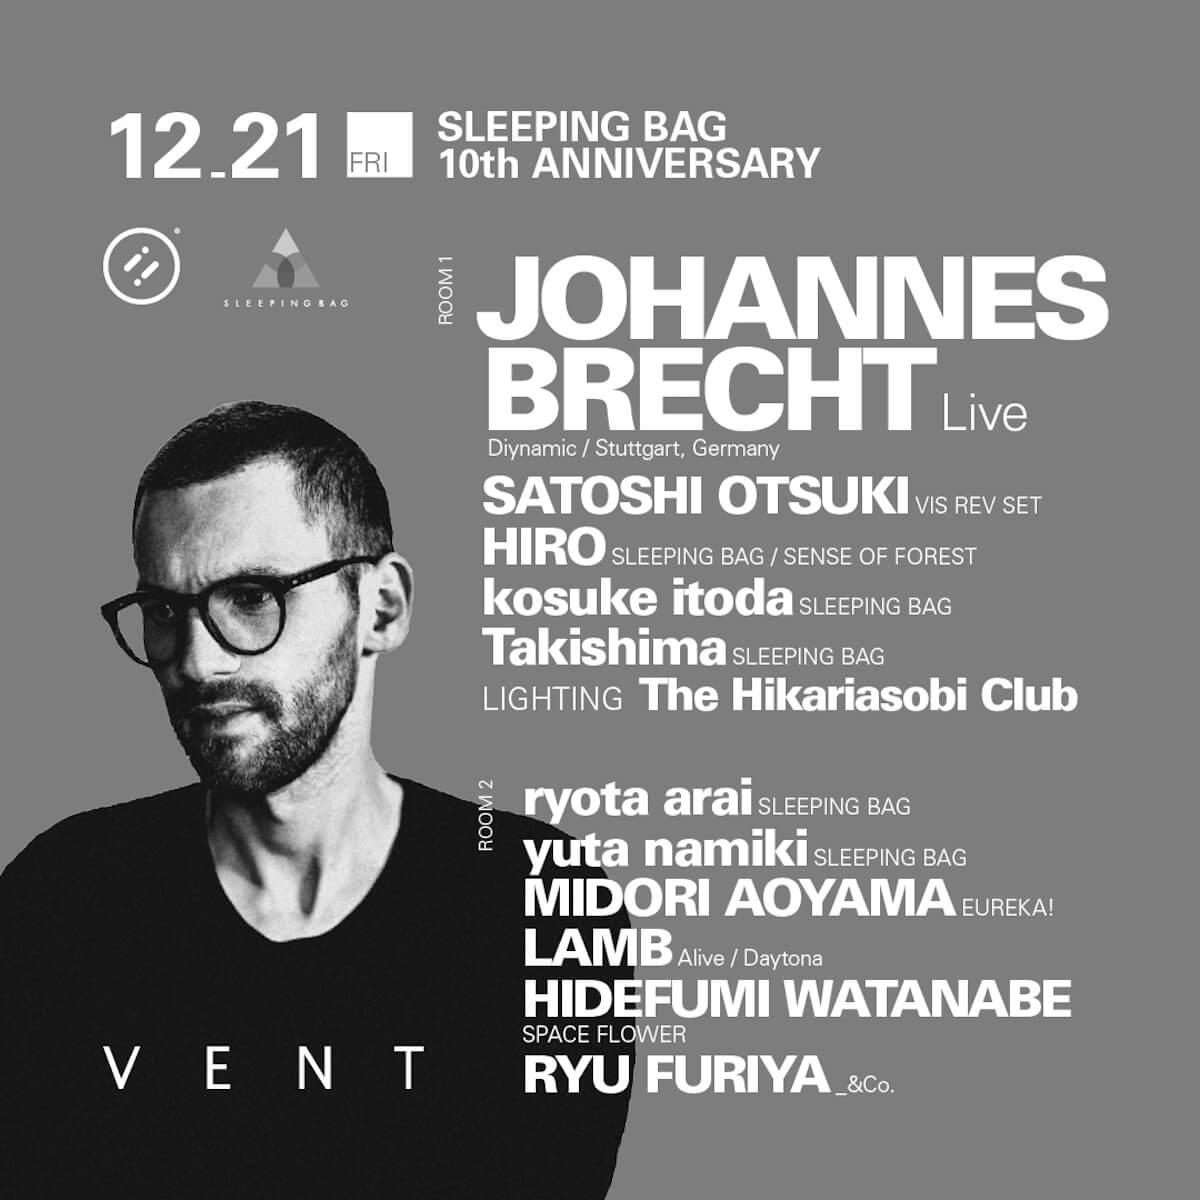 <SLEEPING BAG>座談会|オープン10周年を前にそれぞれが語る、イベントへの熱い想い music181204-vent-johannes-brecht-3